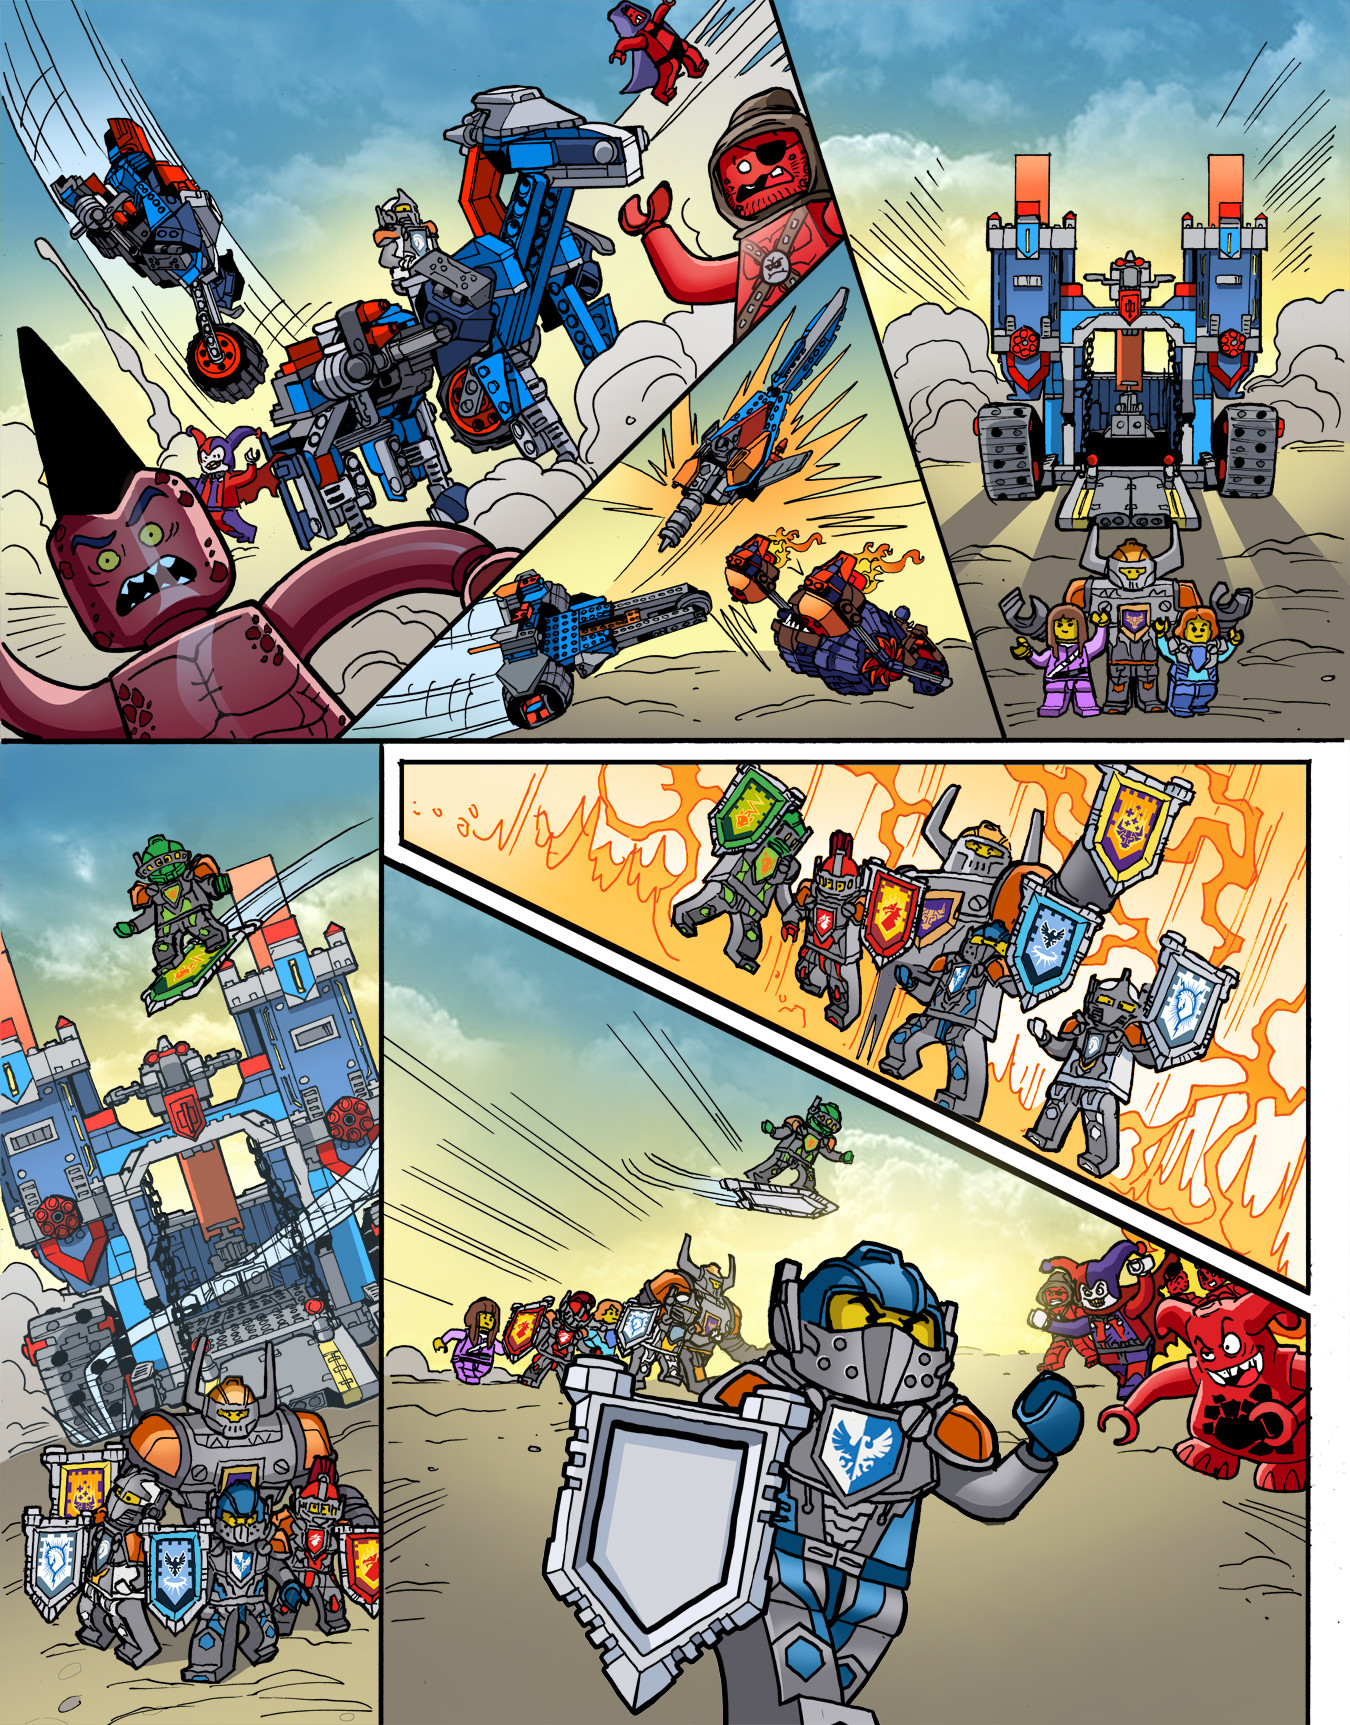 Gabriel cassata nexo knight colors page 2v2